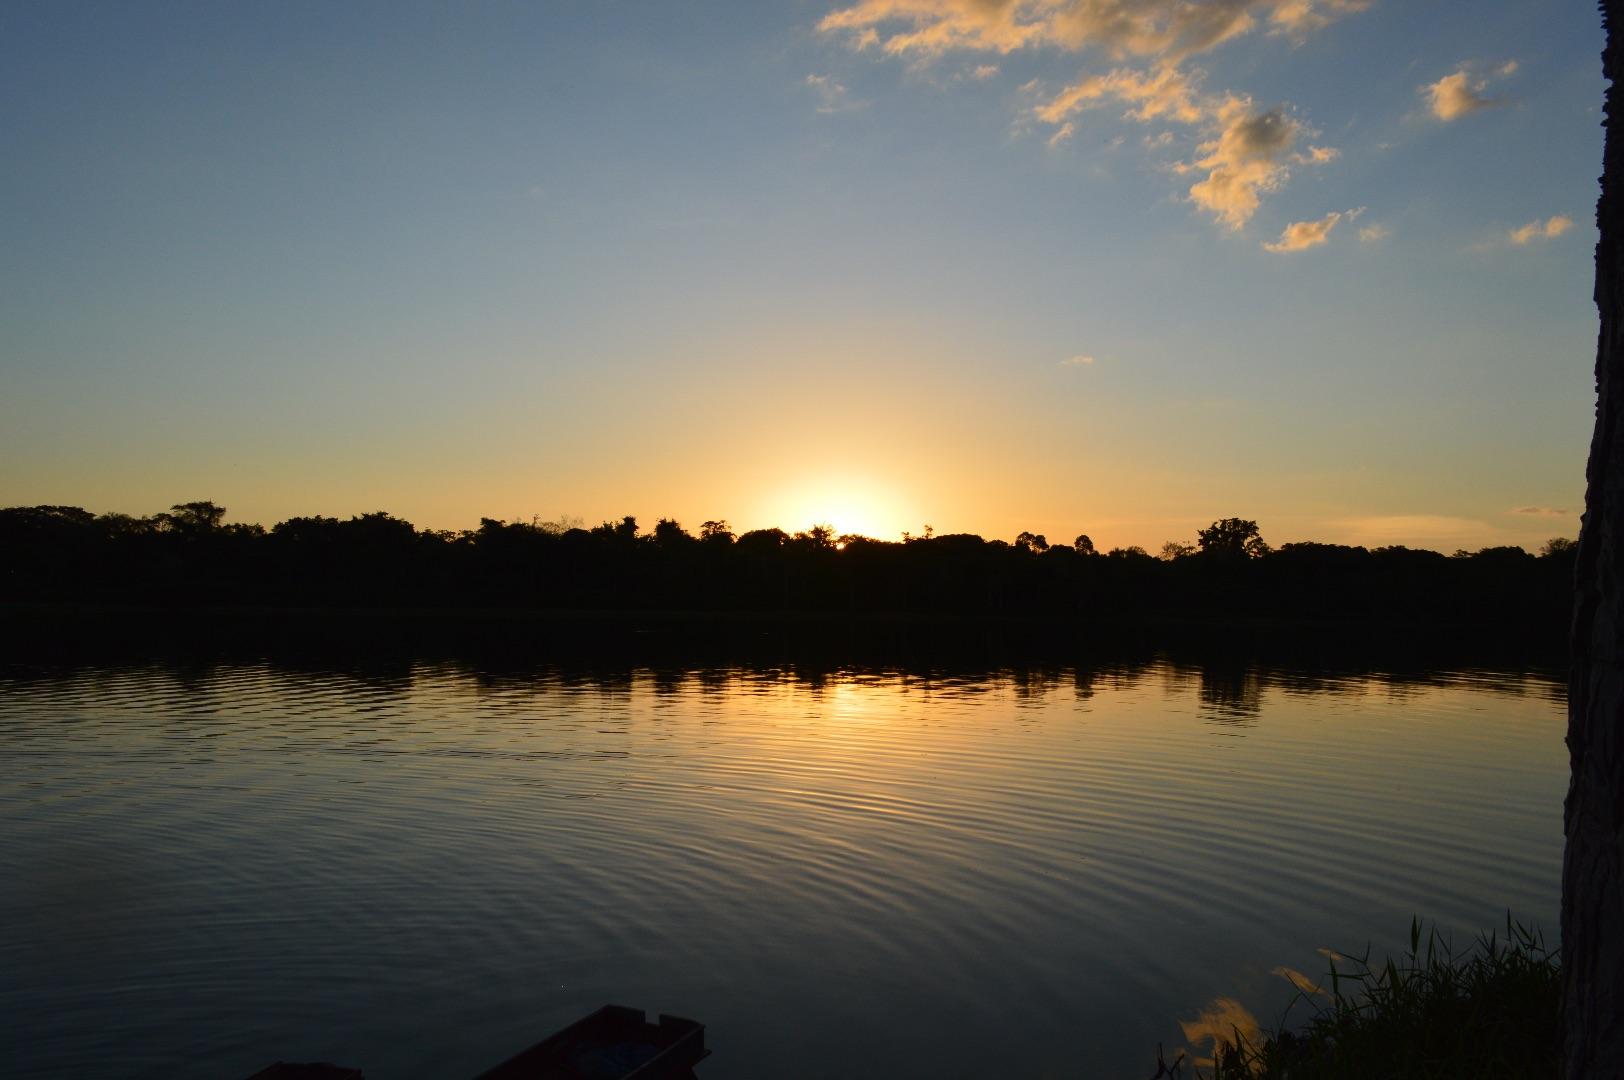 Sunset view in the Brazilian Amazon. Photo: Laura Castro-Diaz